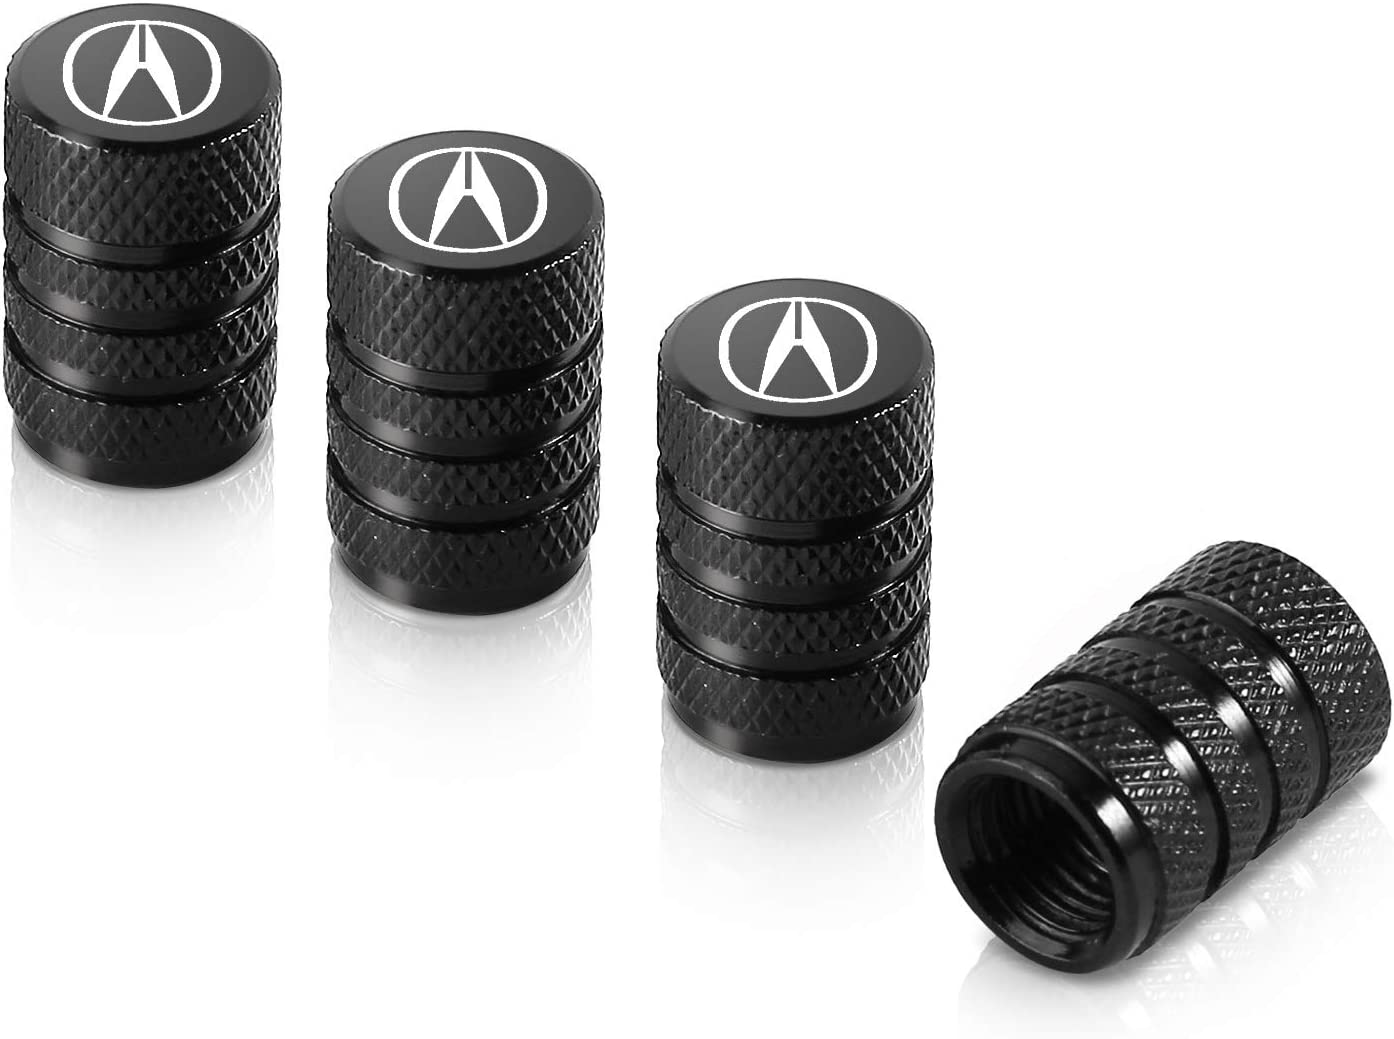 Qideloon Auto 4 Pack Tire Valve Stem Caps,Universal Aluminium Stem Covers Fit for Acura Accessories